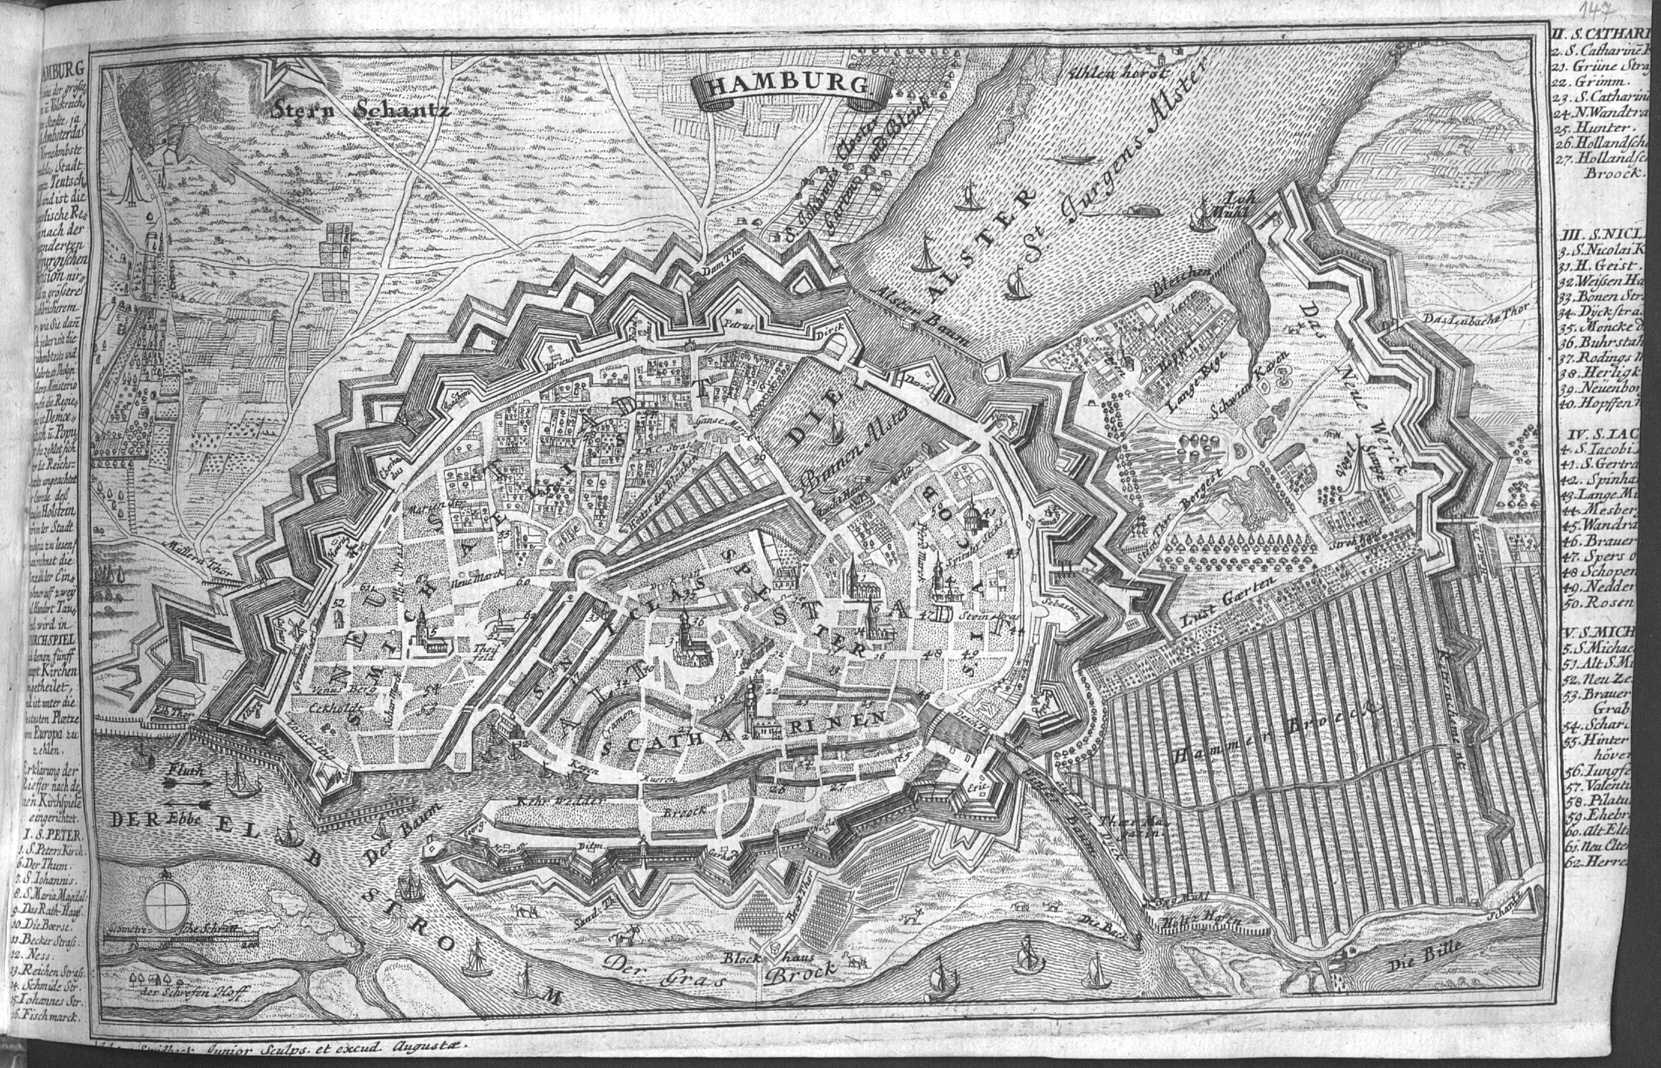 hamburg-1700.jpg